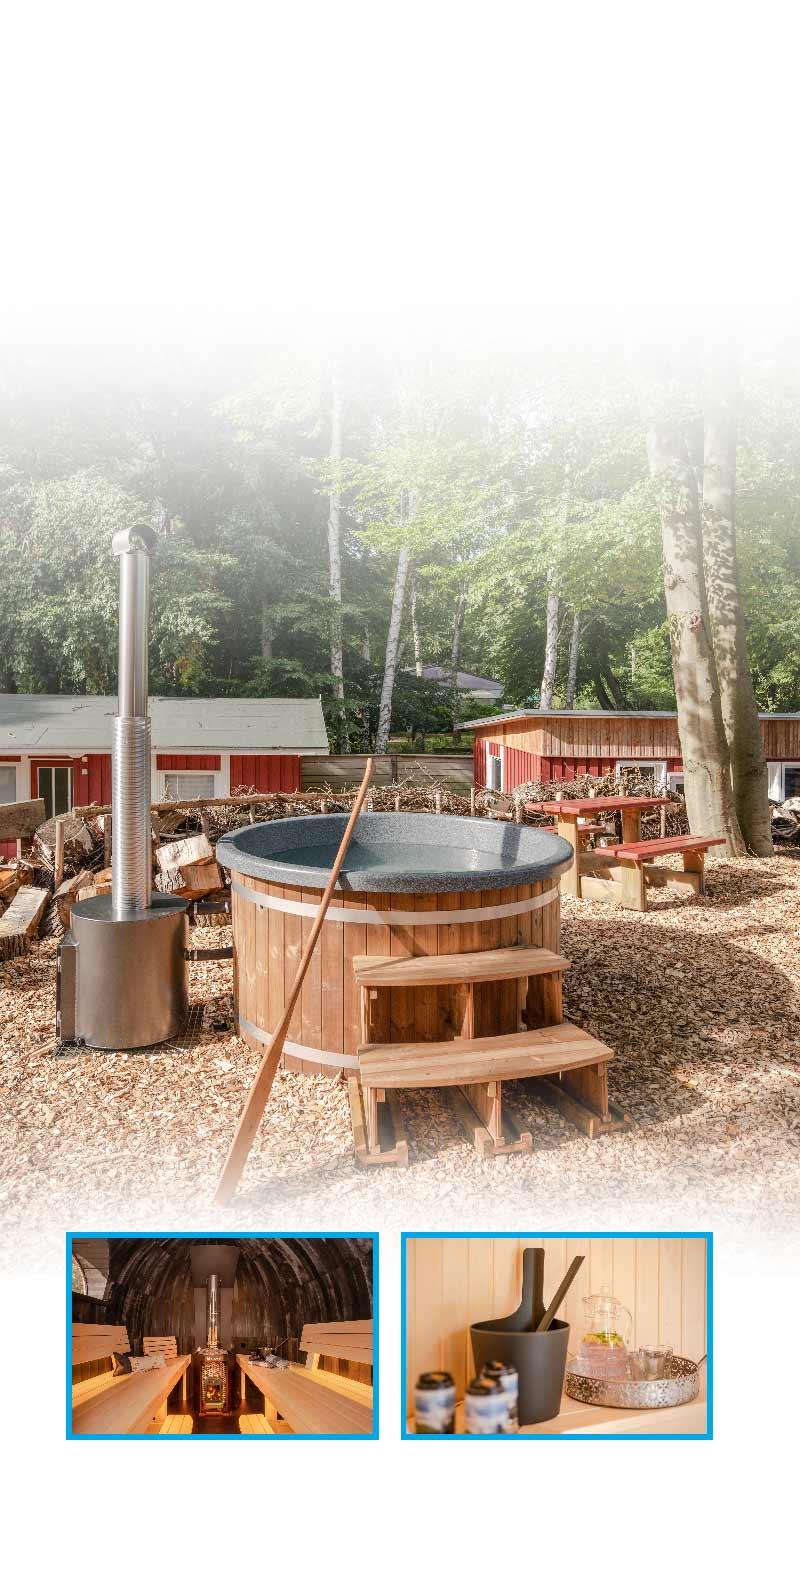 Wellnessurlaub Feriensiedlung Hinter der Düne Urlaub Insel Usedom Seebad Ückeritz